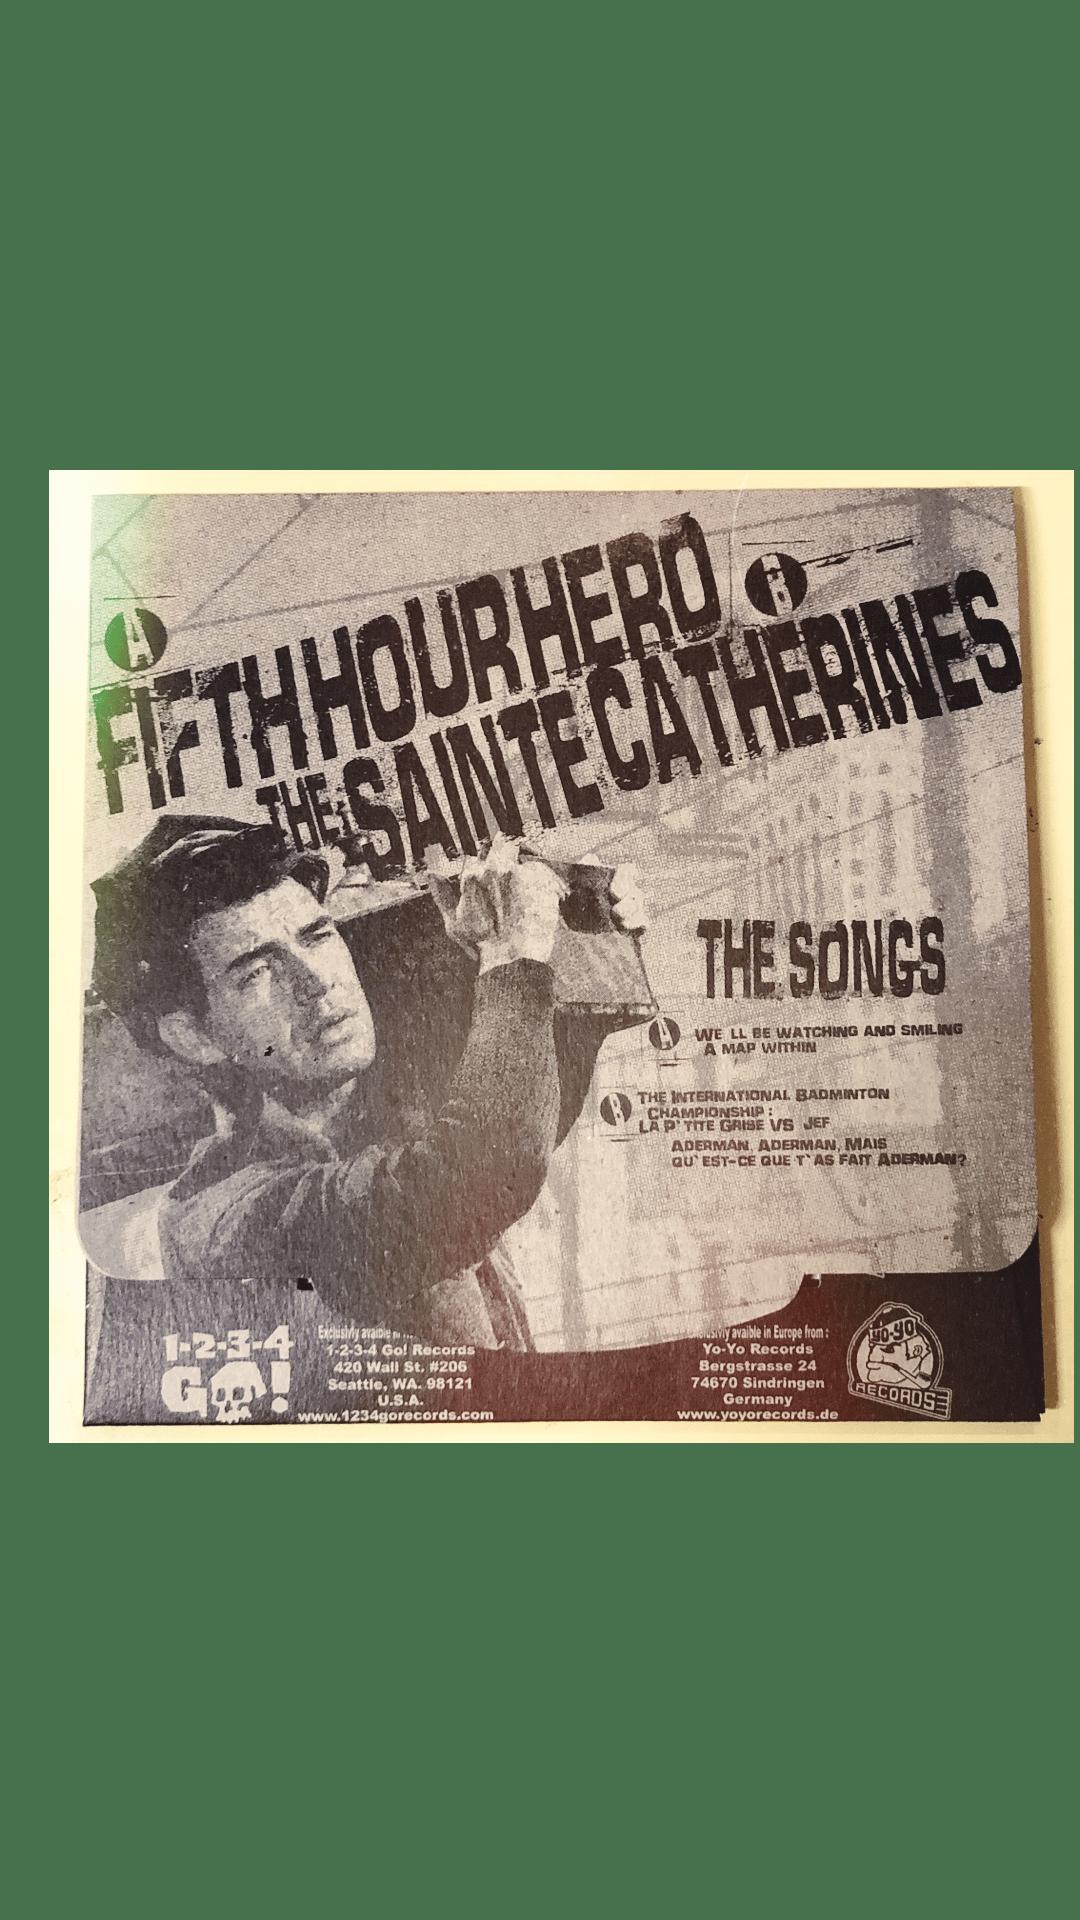 Image of Fifth Hour Hero / The Sainte Catherines split 7 inch